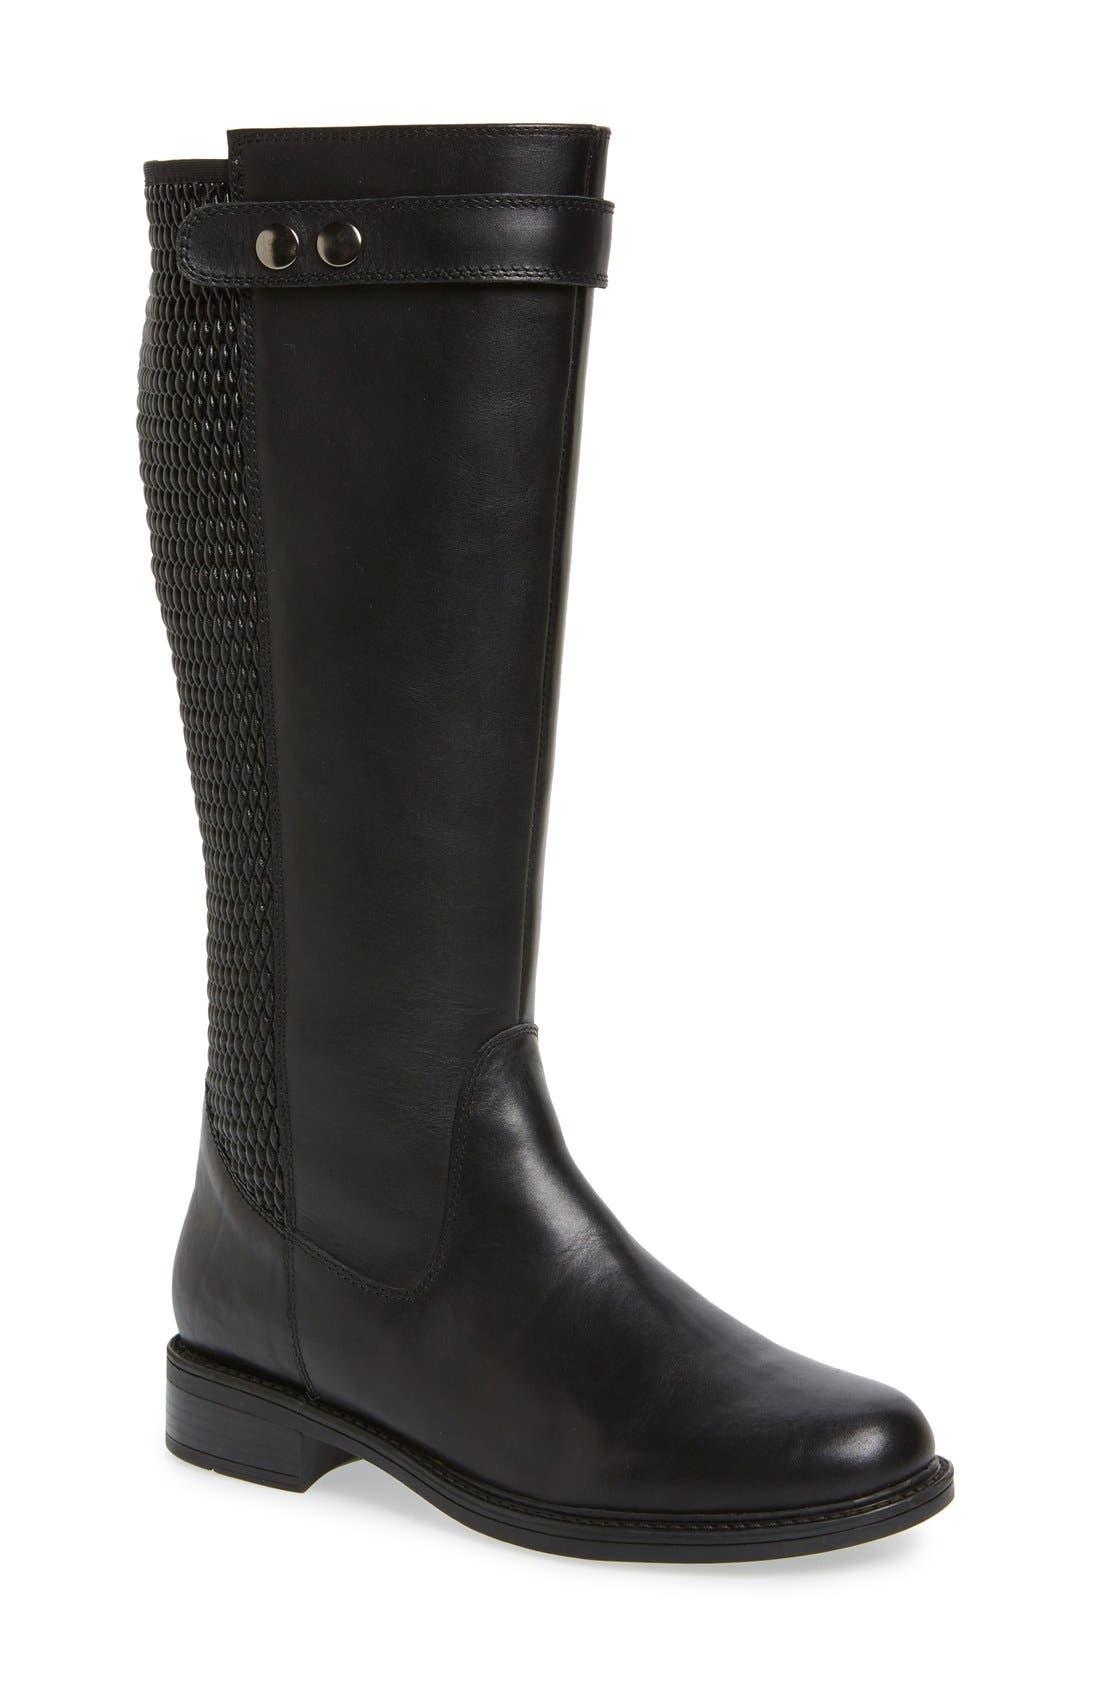 David Tate 'Avery' Knee High Boot (Women)